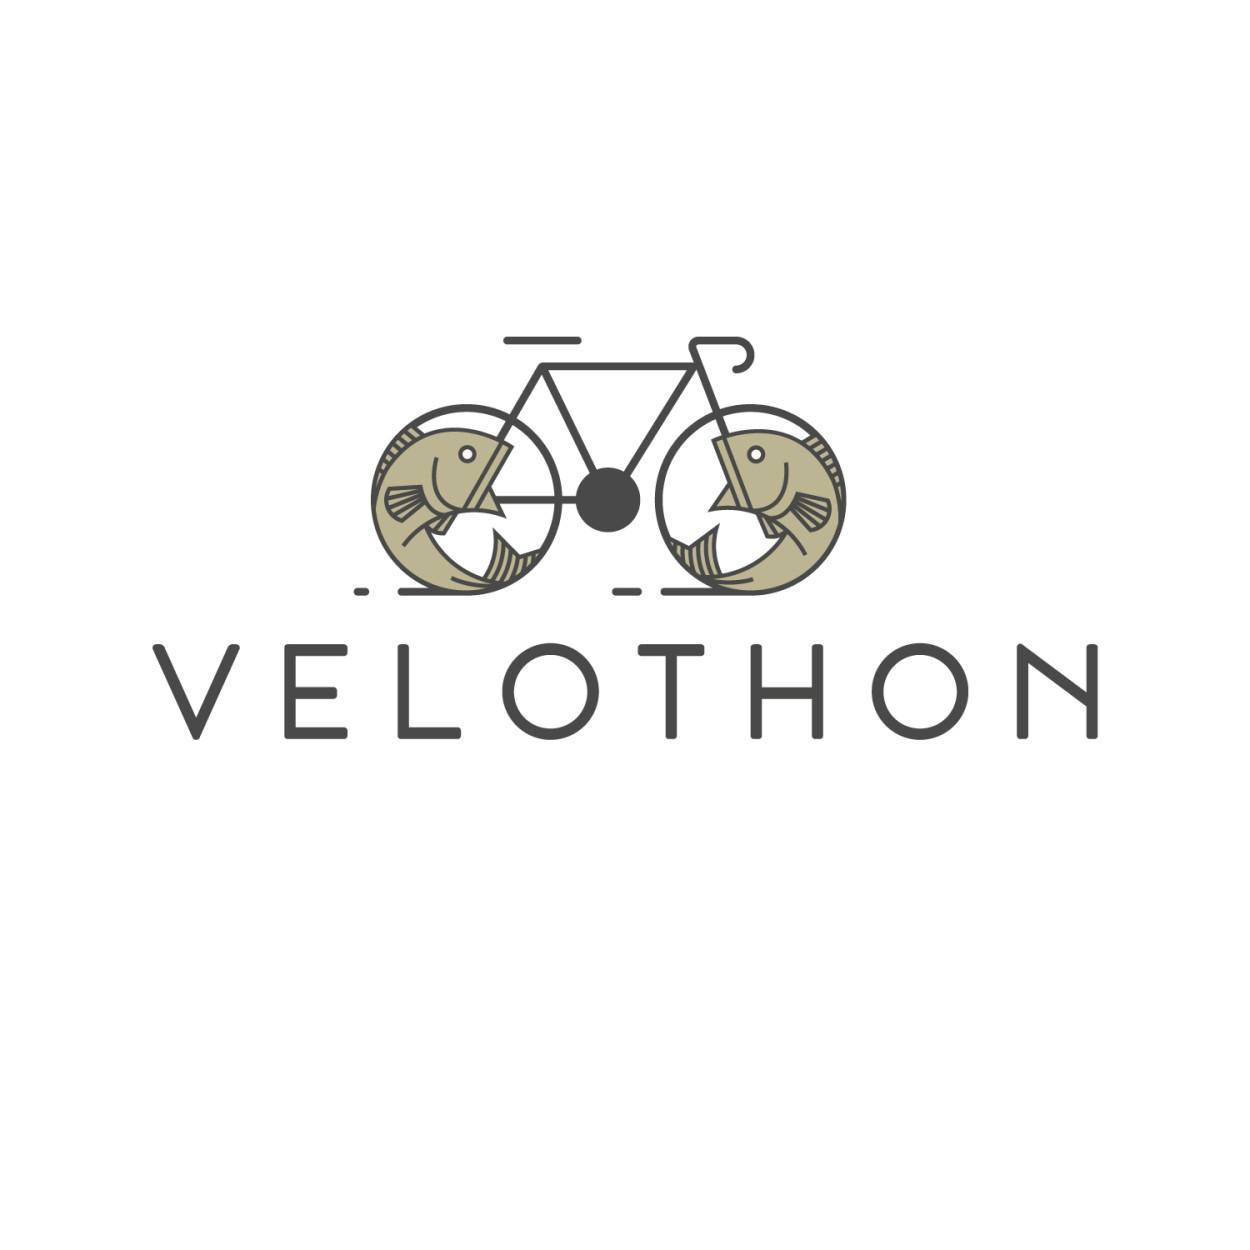 VELOTHON-LOGOTYPE-COULEUR.jpg